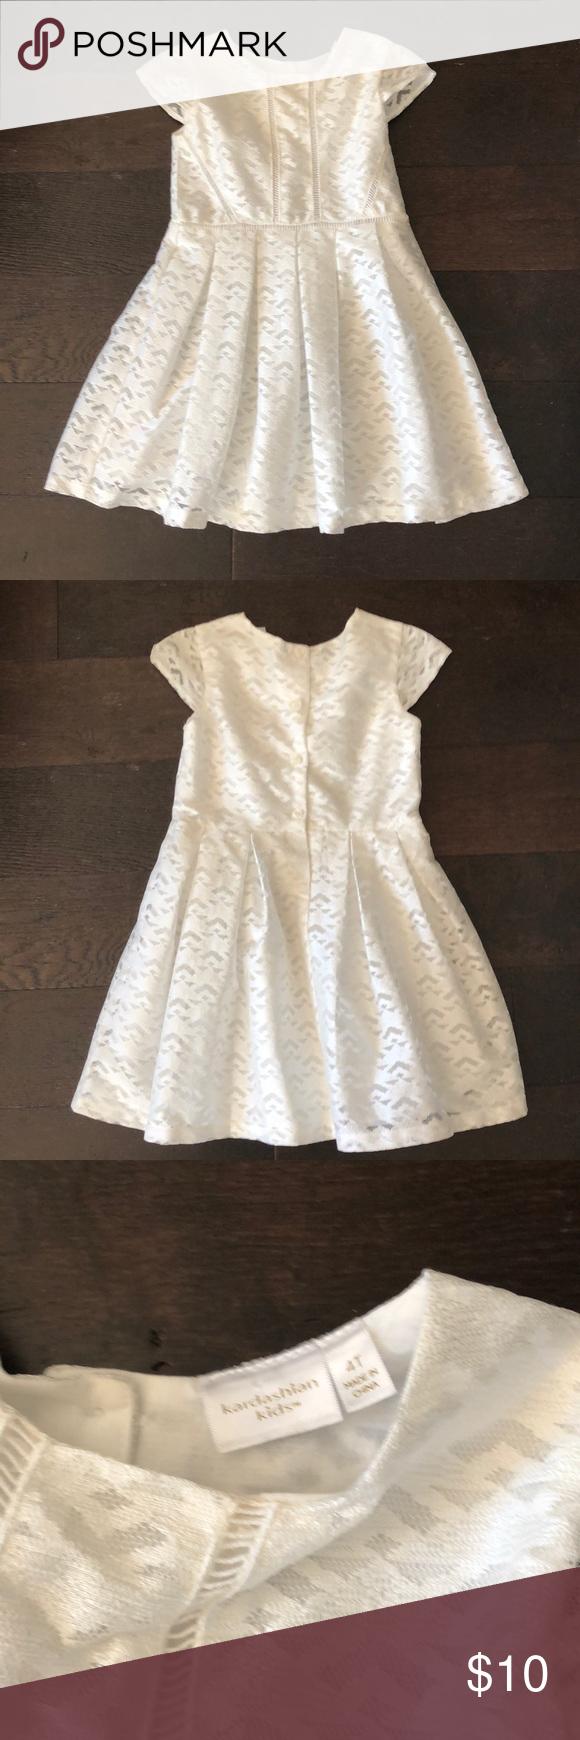 White Lace Dress 4t Lace White Dress Lace Dress Clothes Design [ 1740 x 580 Pixel ]